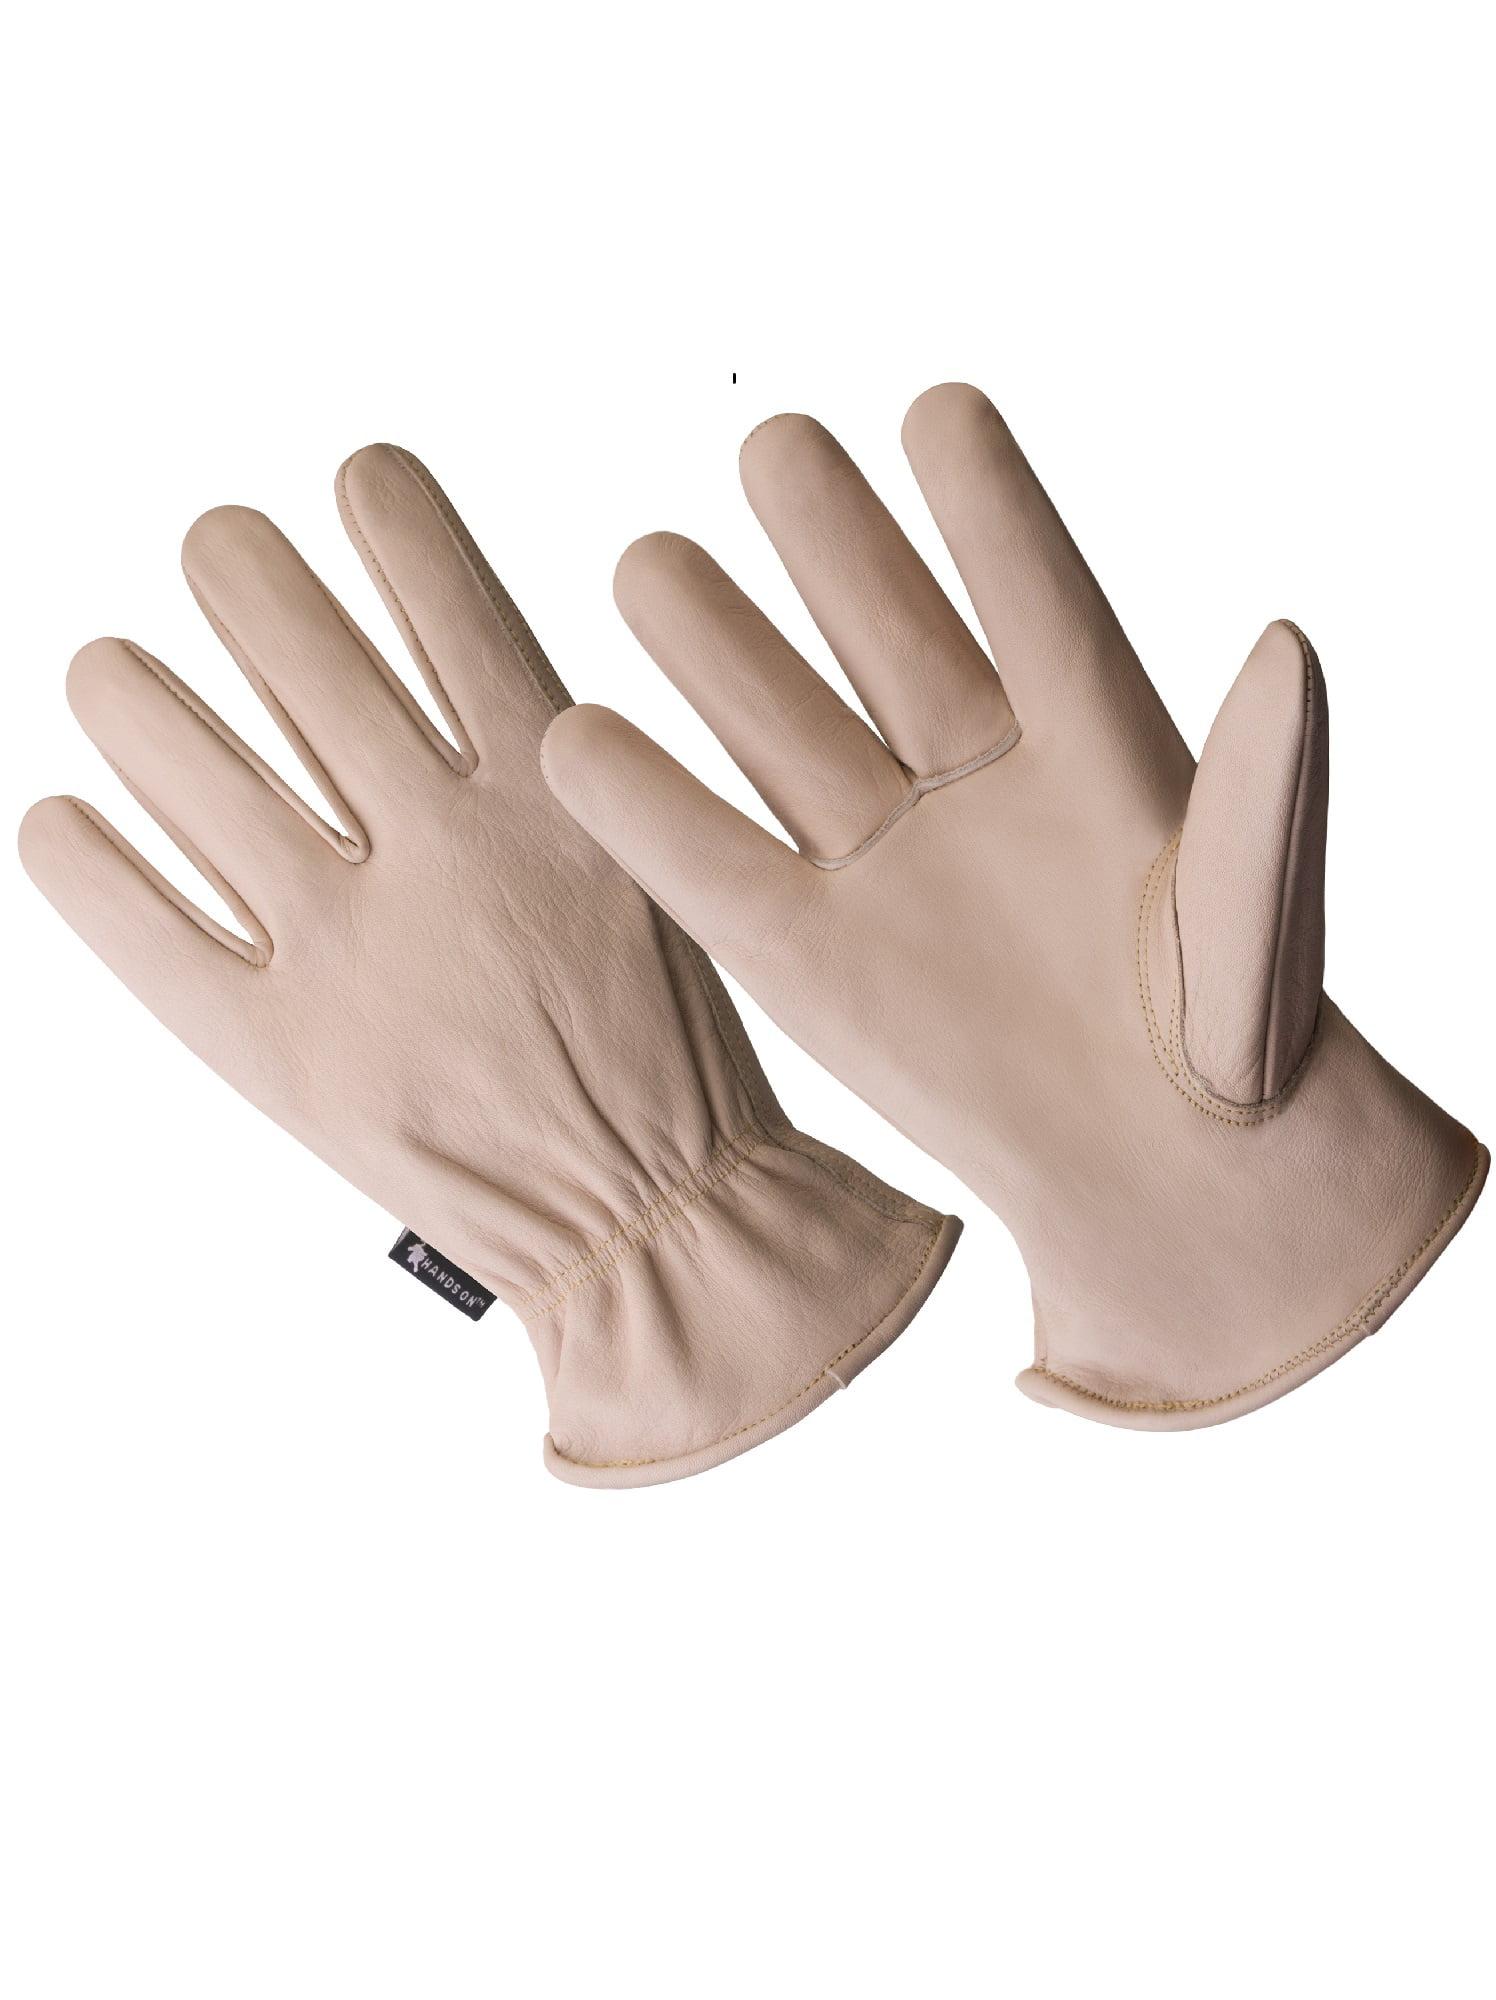 LD5002-L, Full Leather, Beige Cow Grain Driver Glove